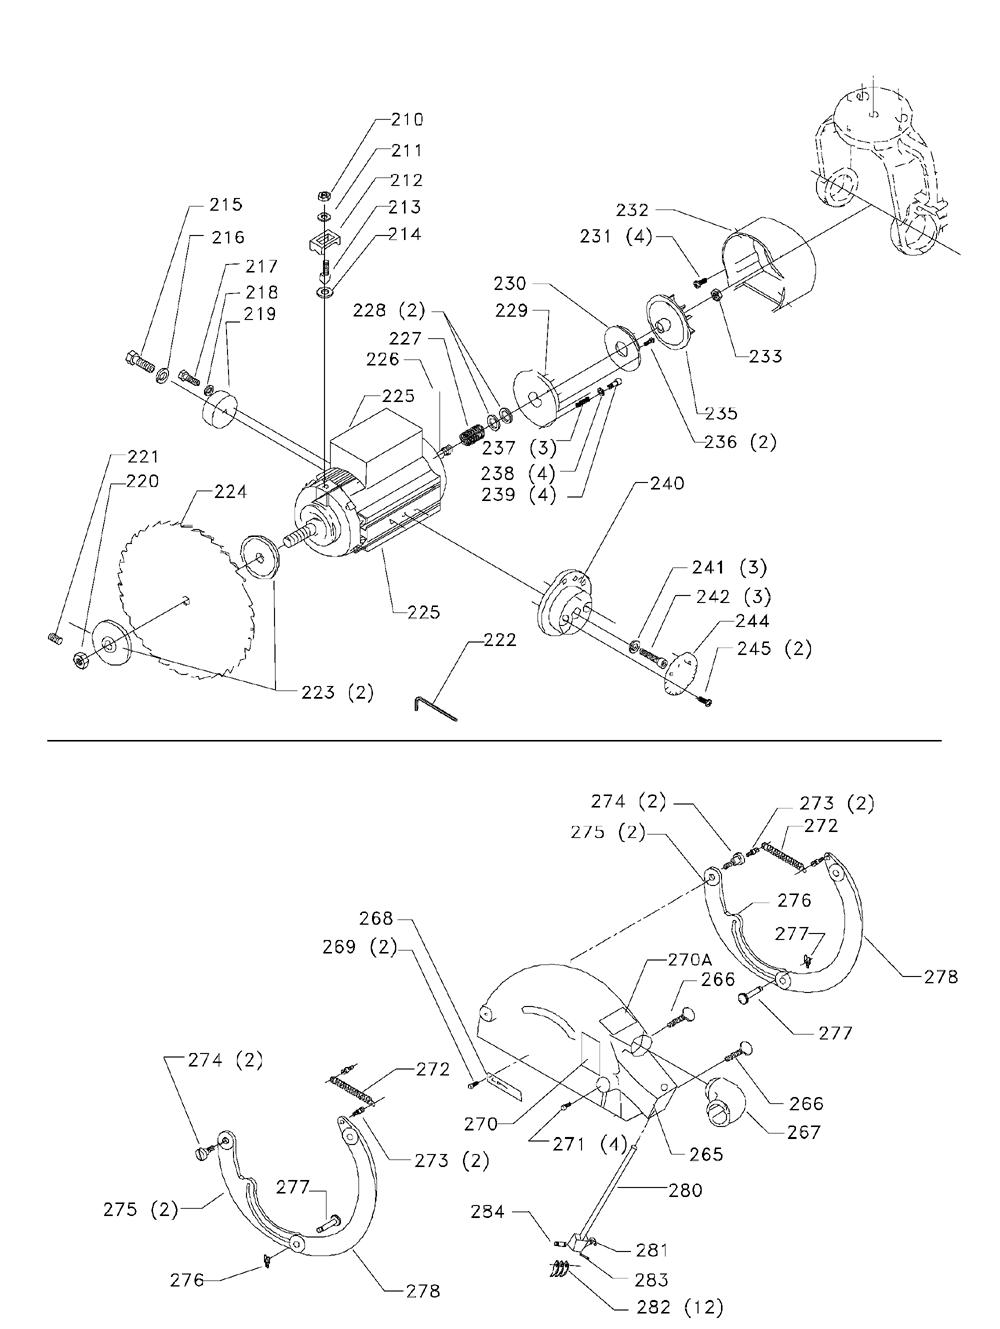 Delta-33-411-Type-2-Parts-1958-PBBreak Down